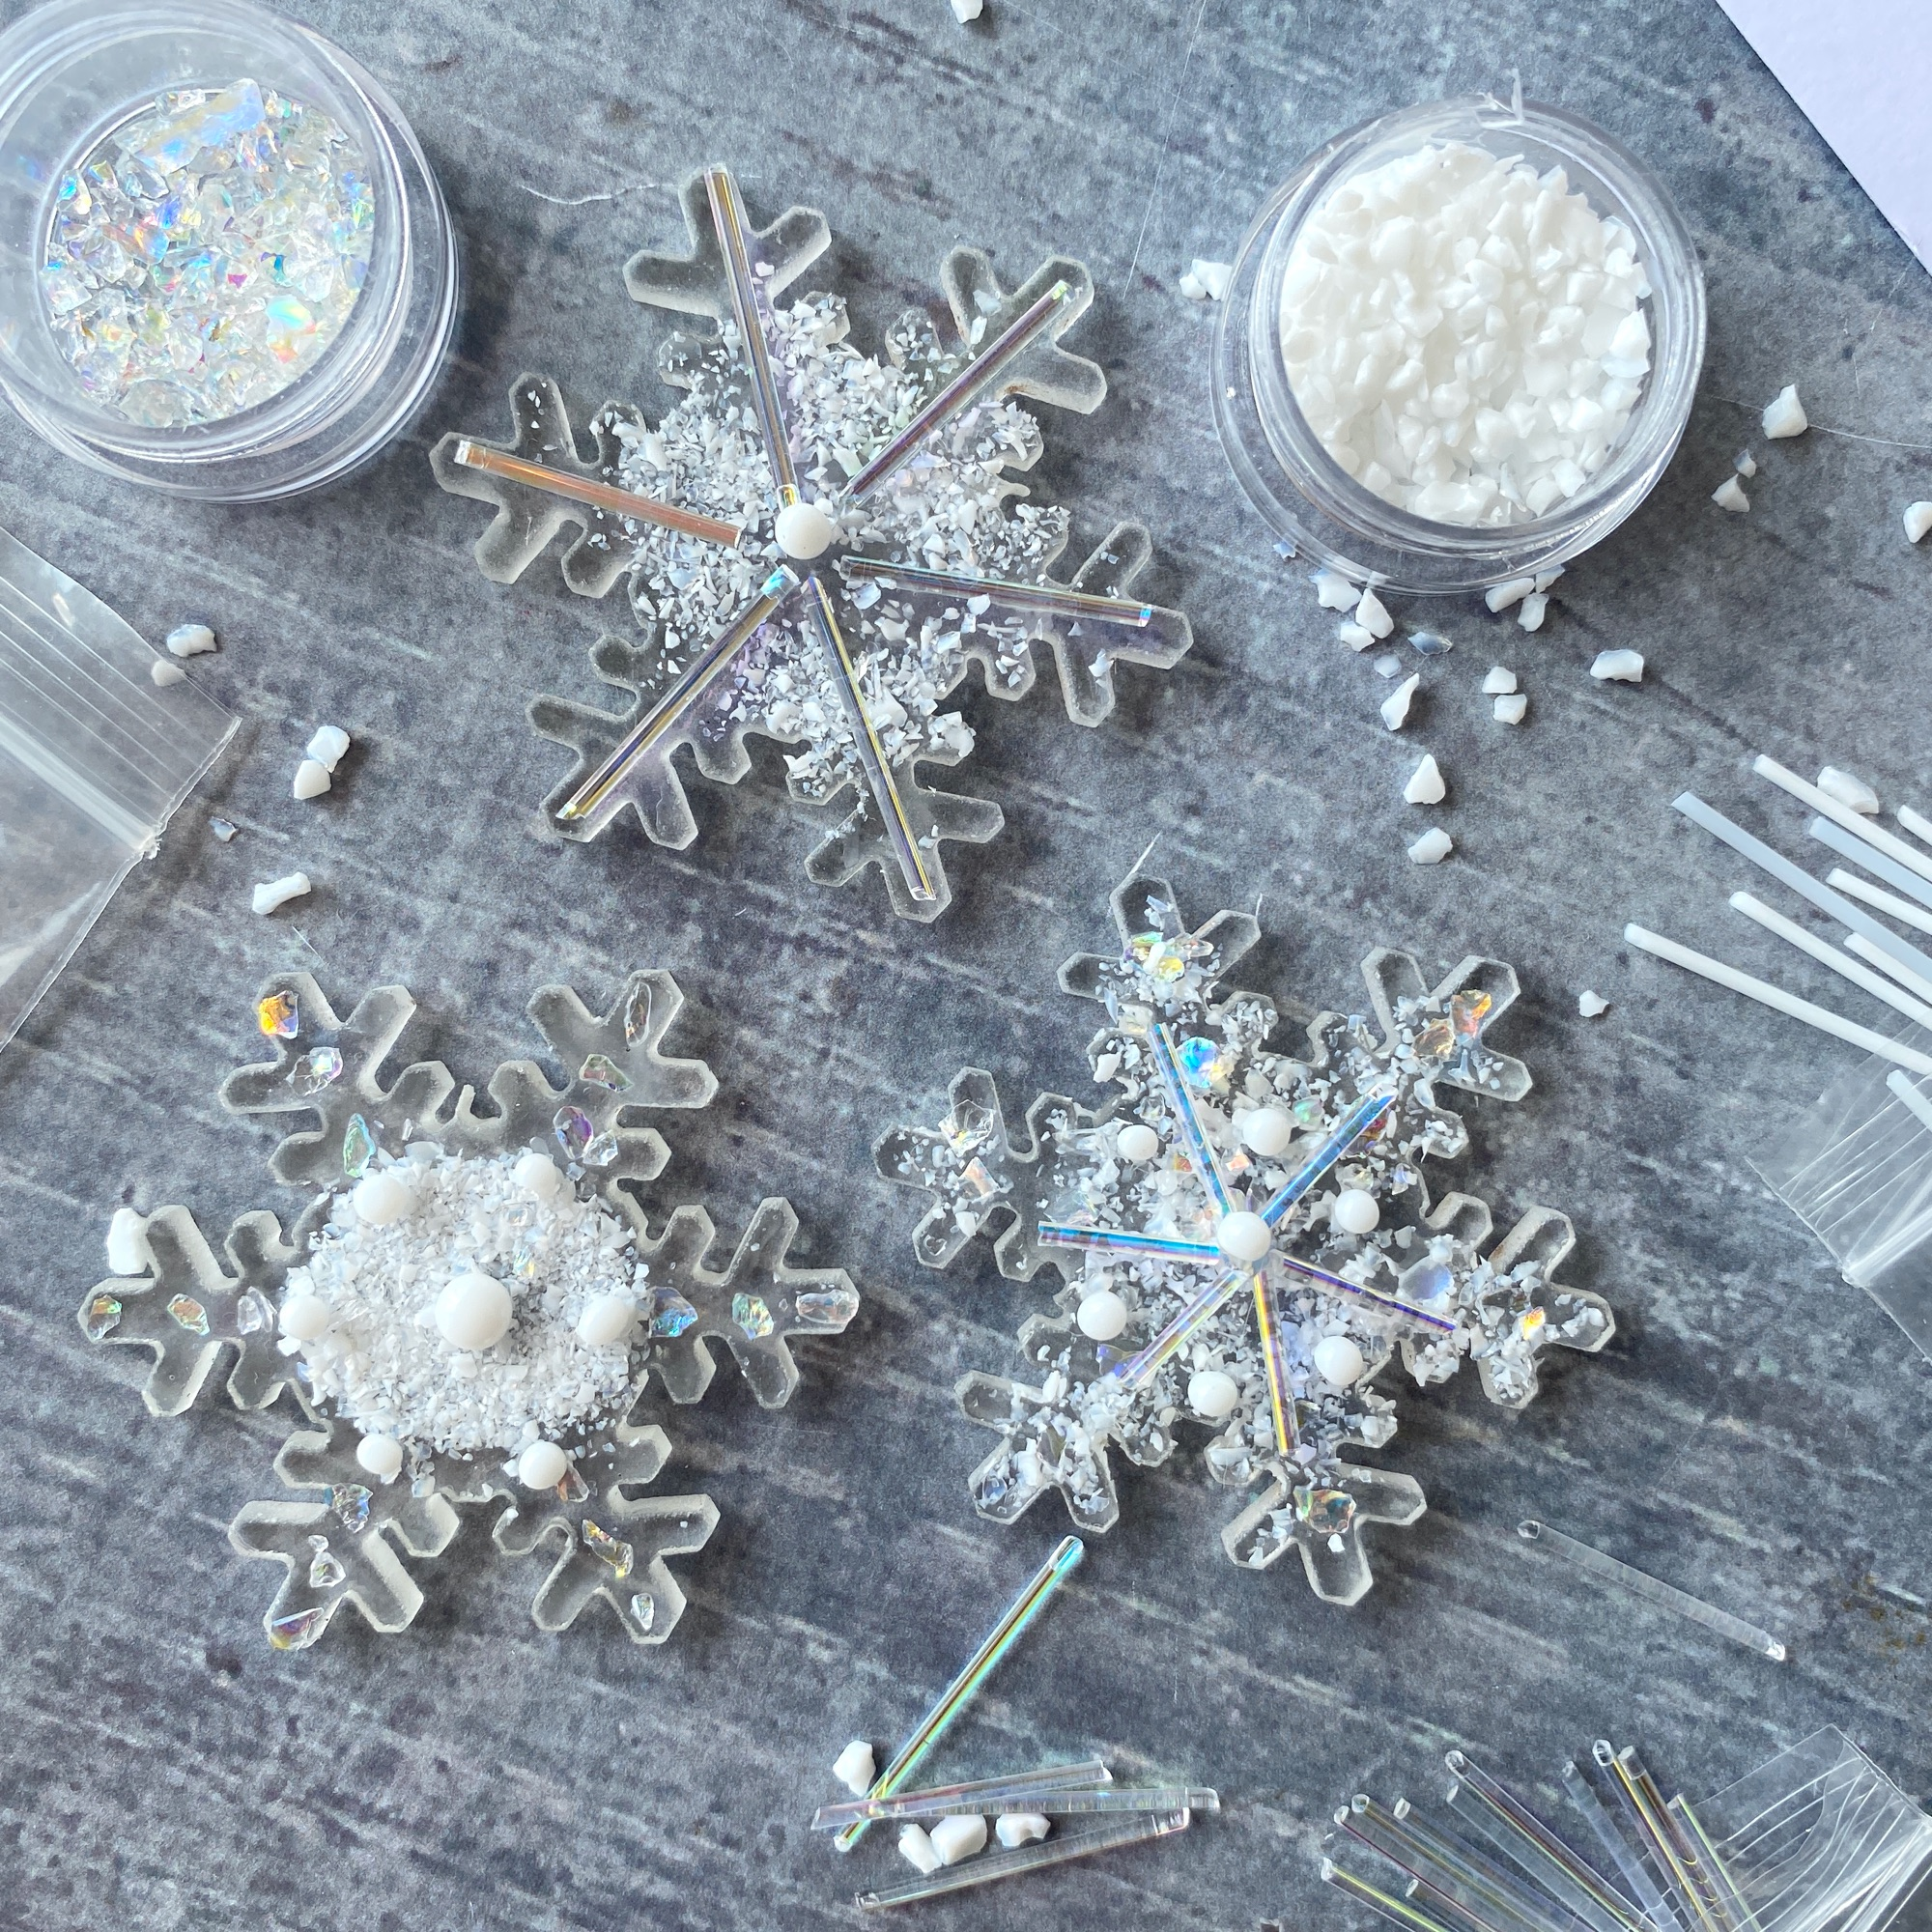 Make at home fused glass kit blue birds